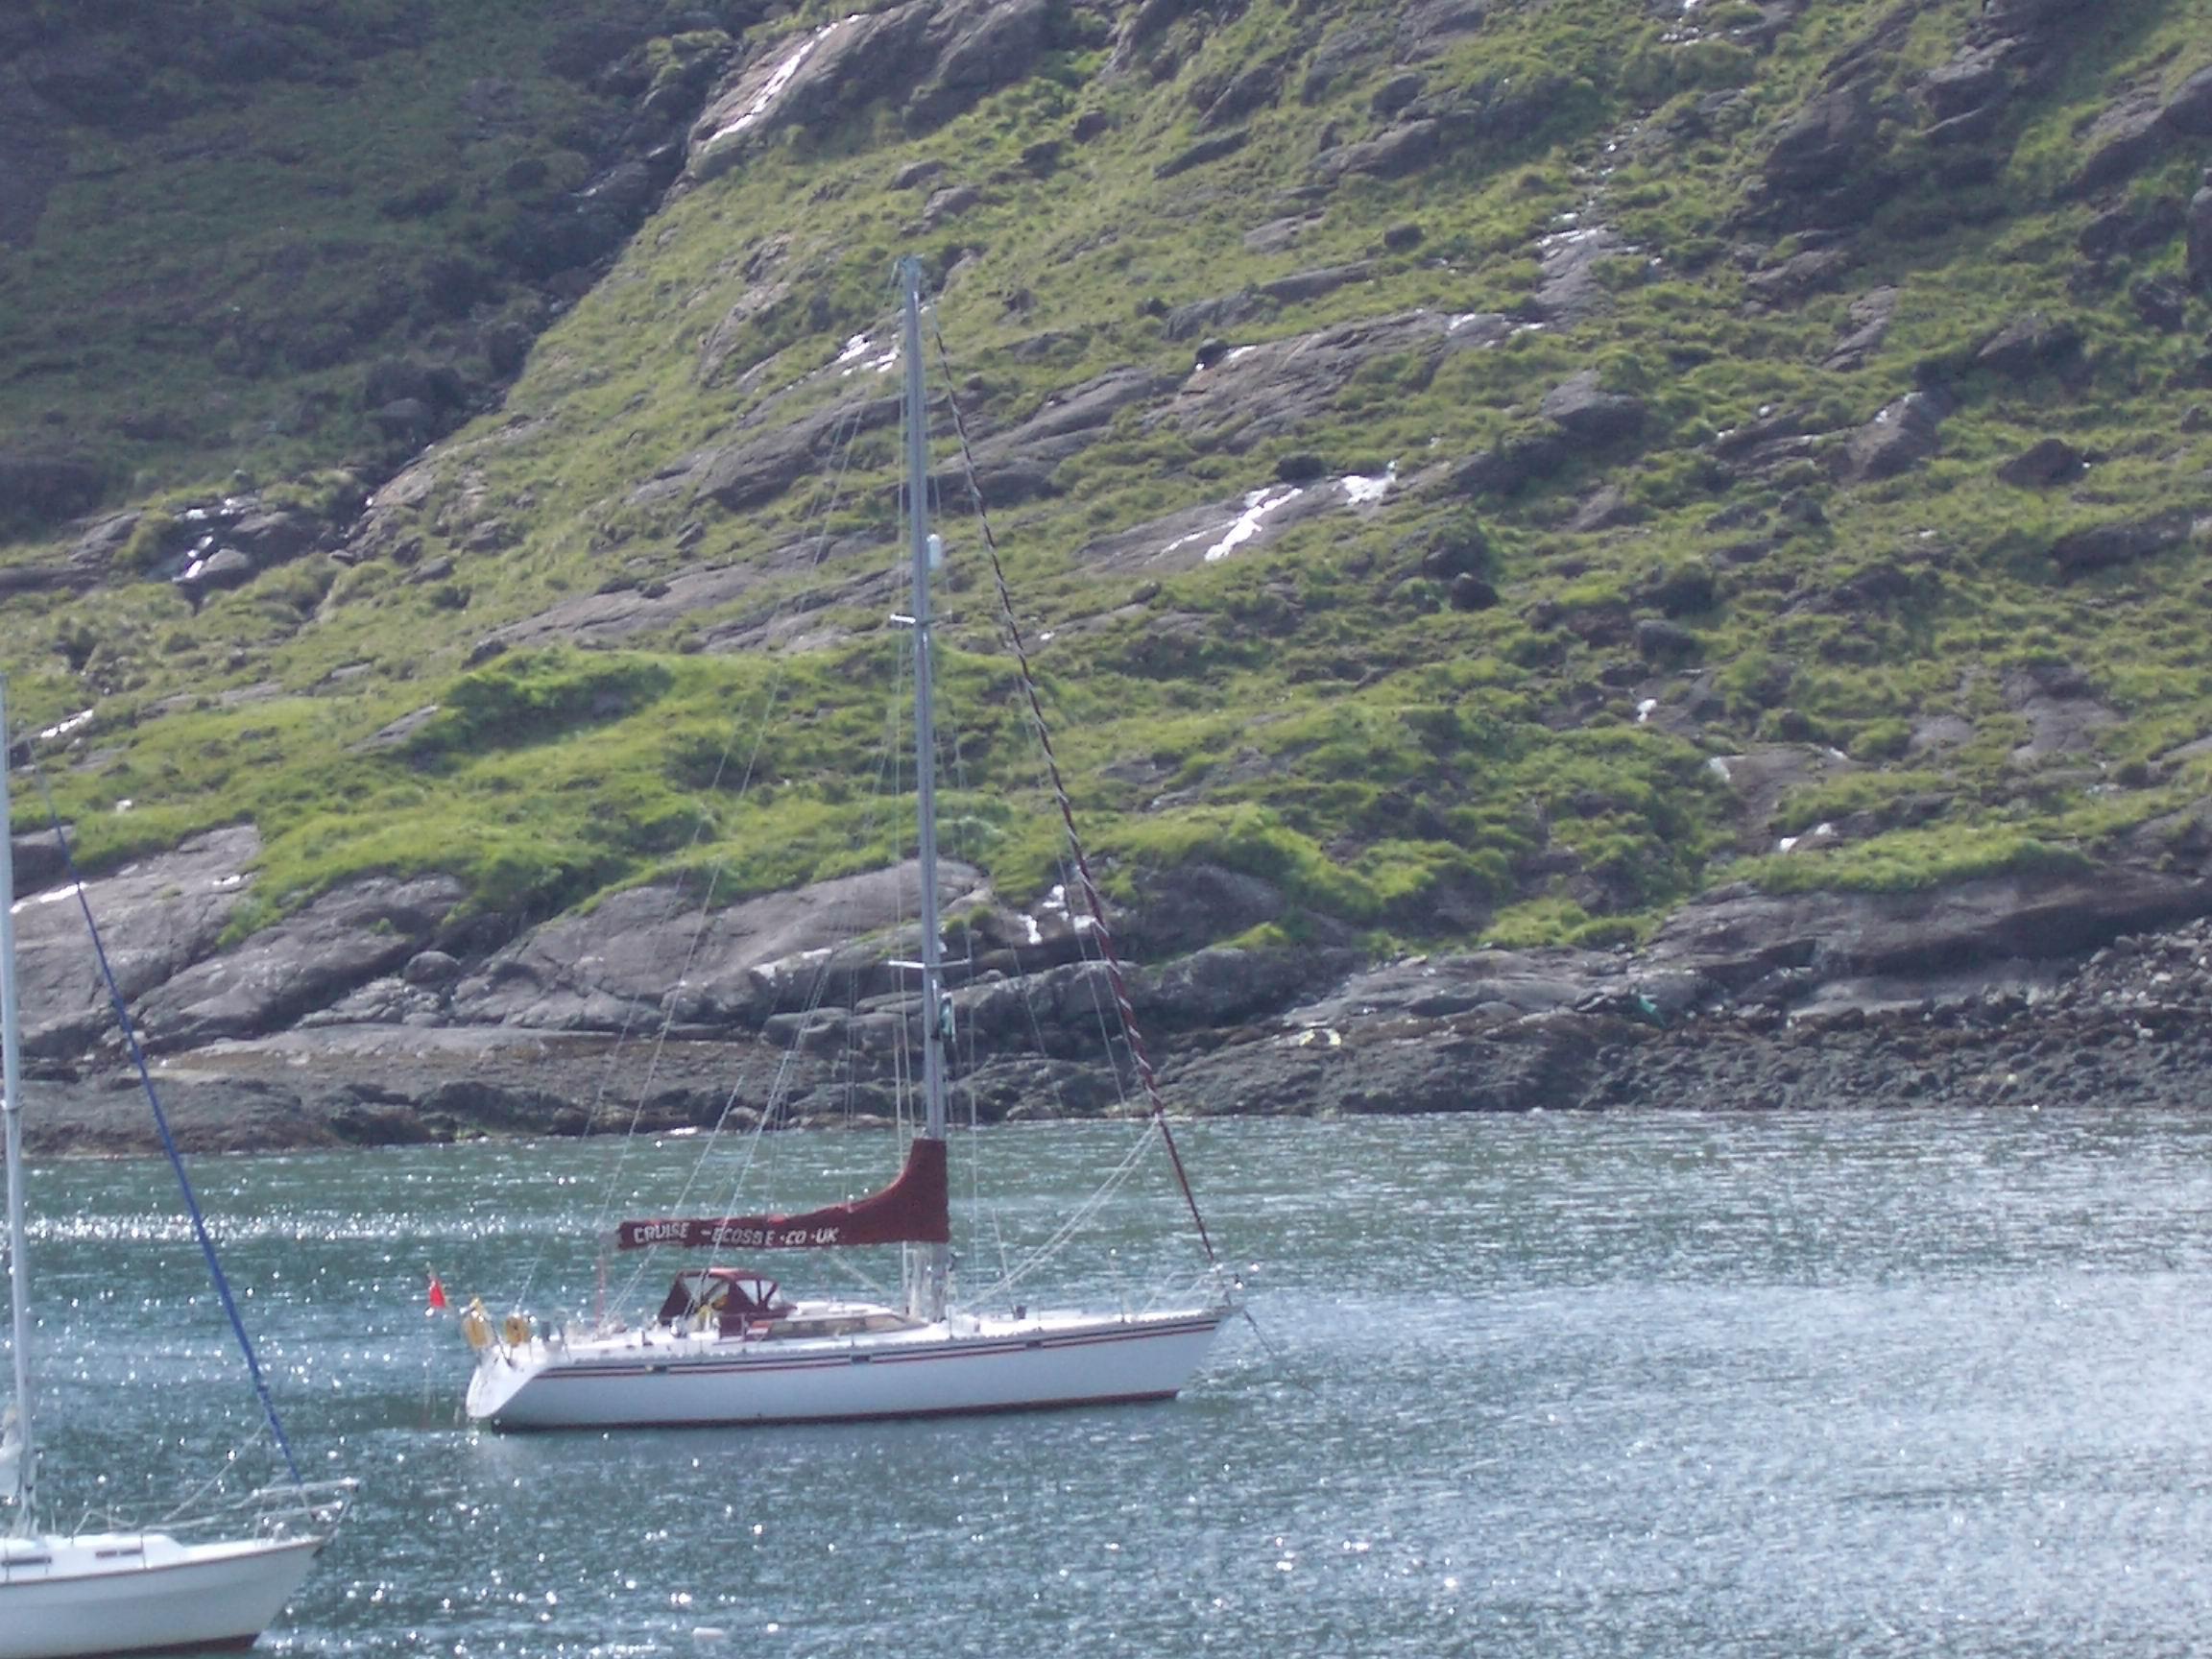 anchored_at_loch_scavaig